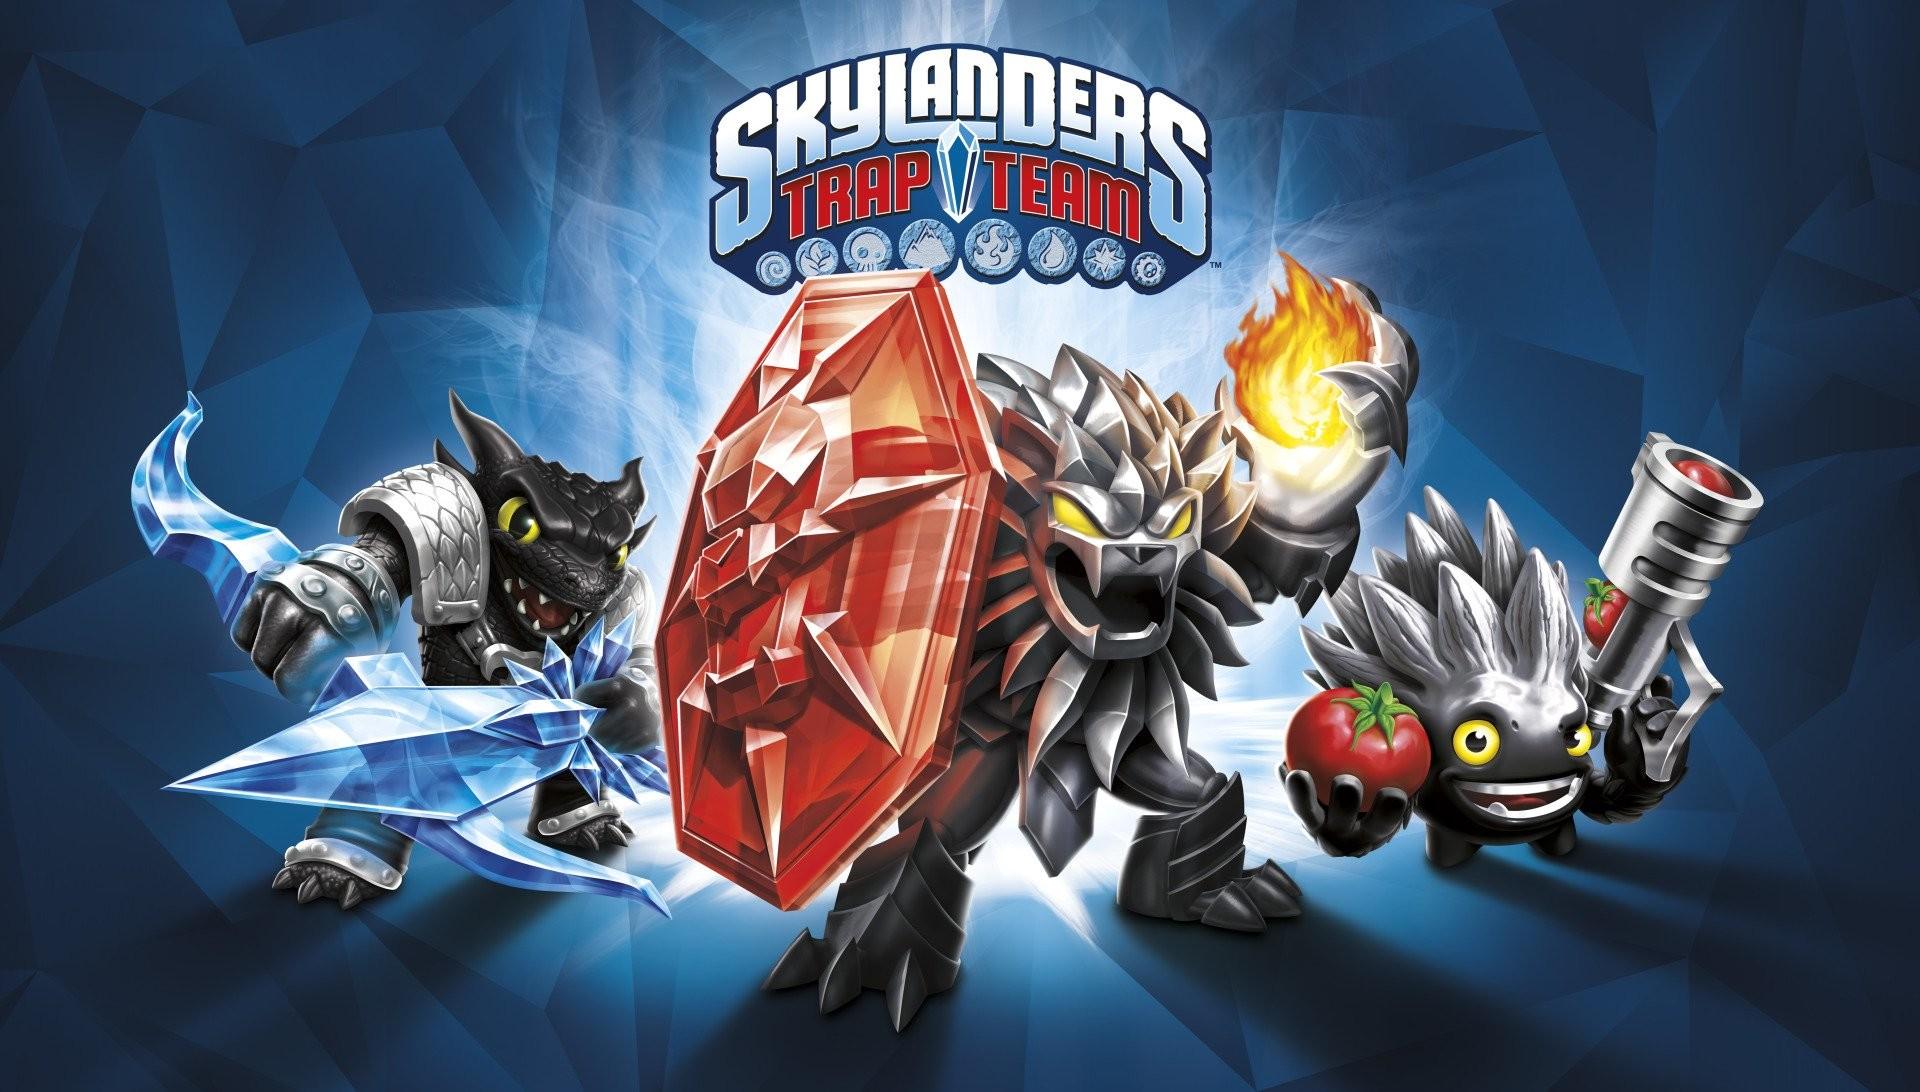 … skylanders trap team the best ps4 games for kids …